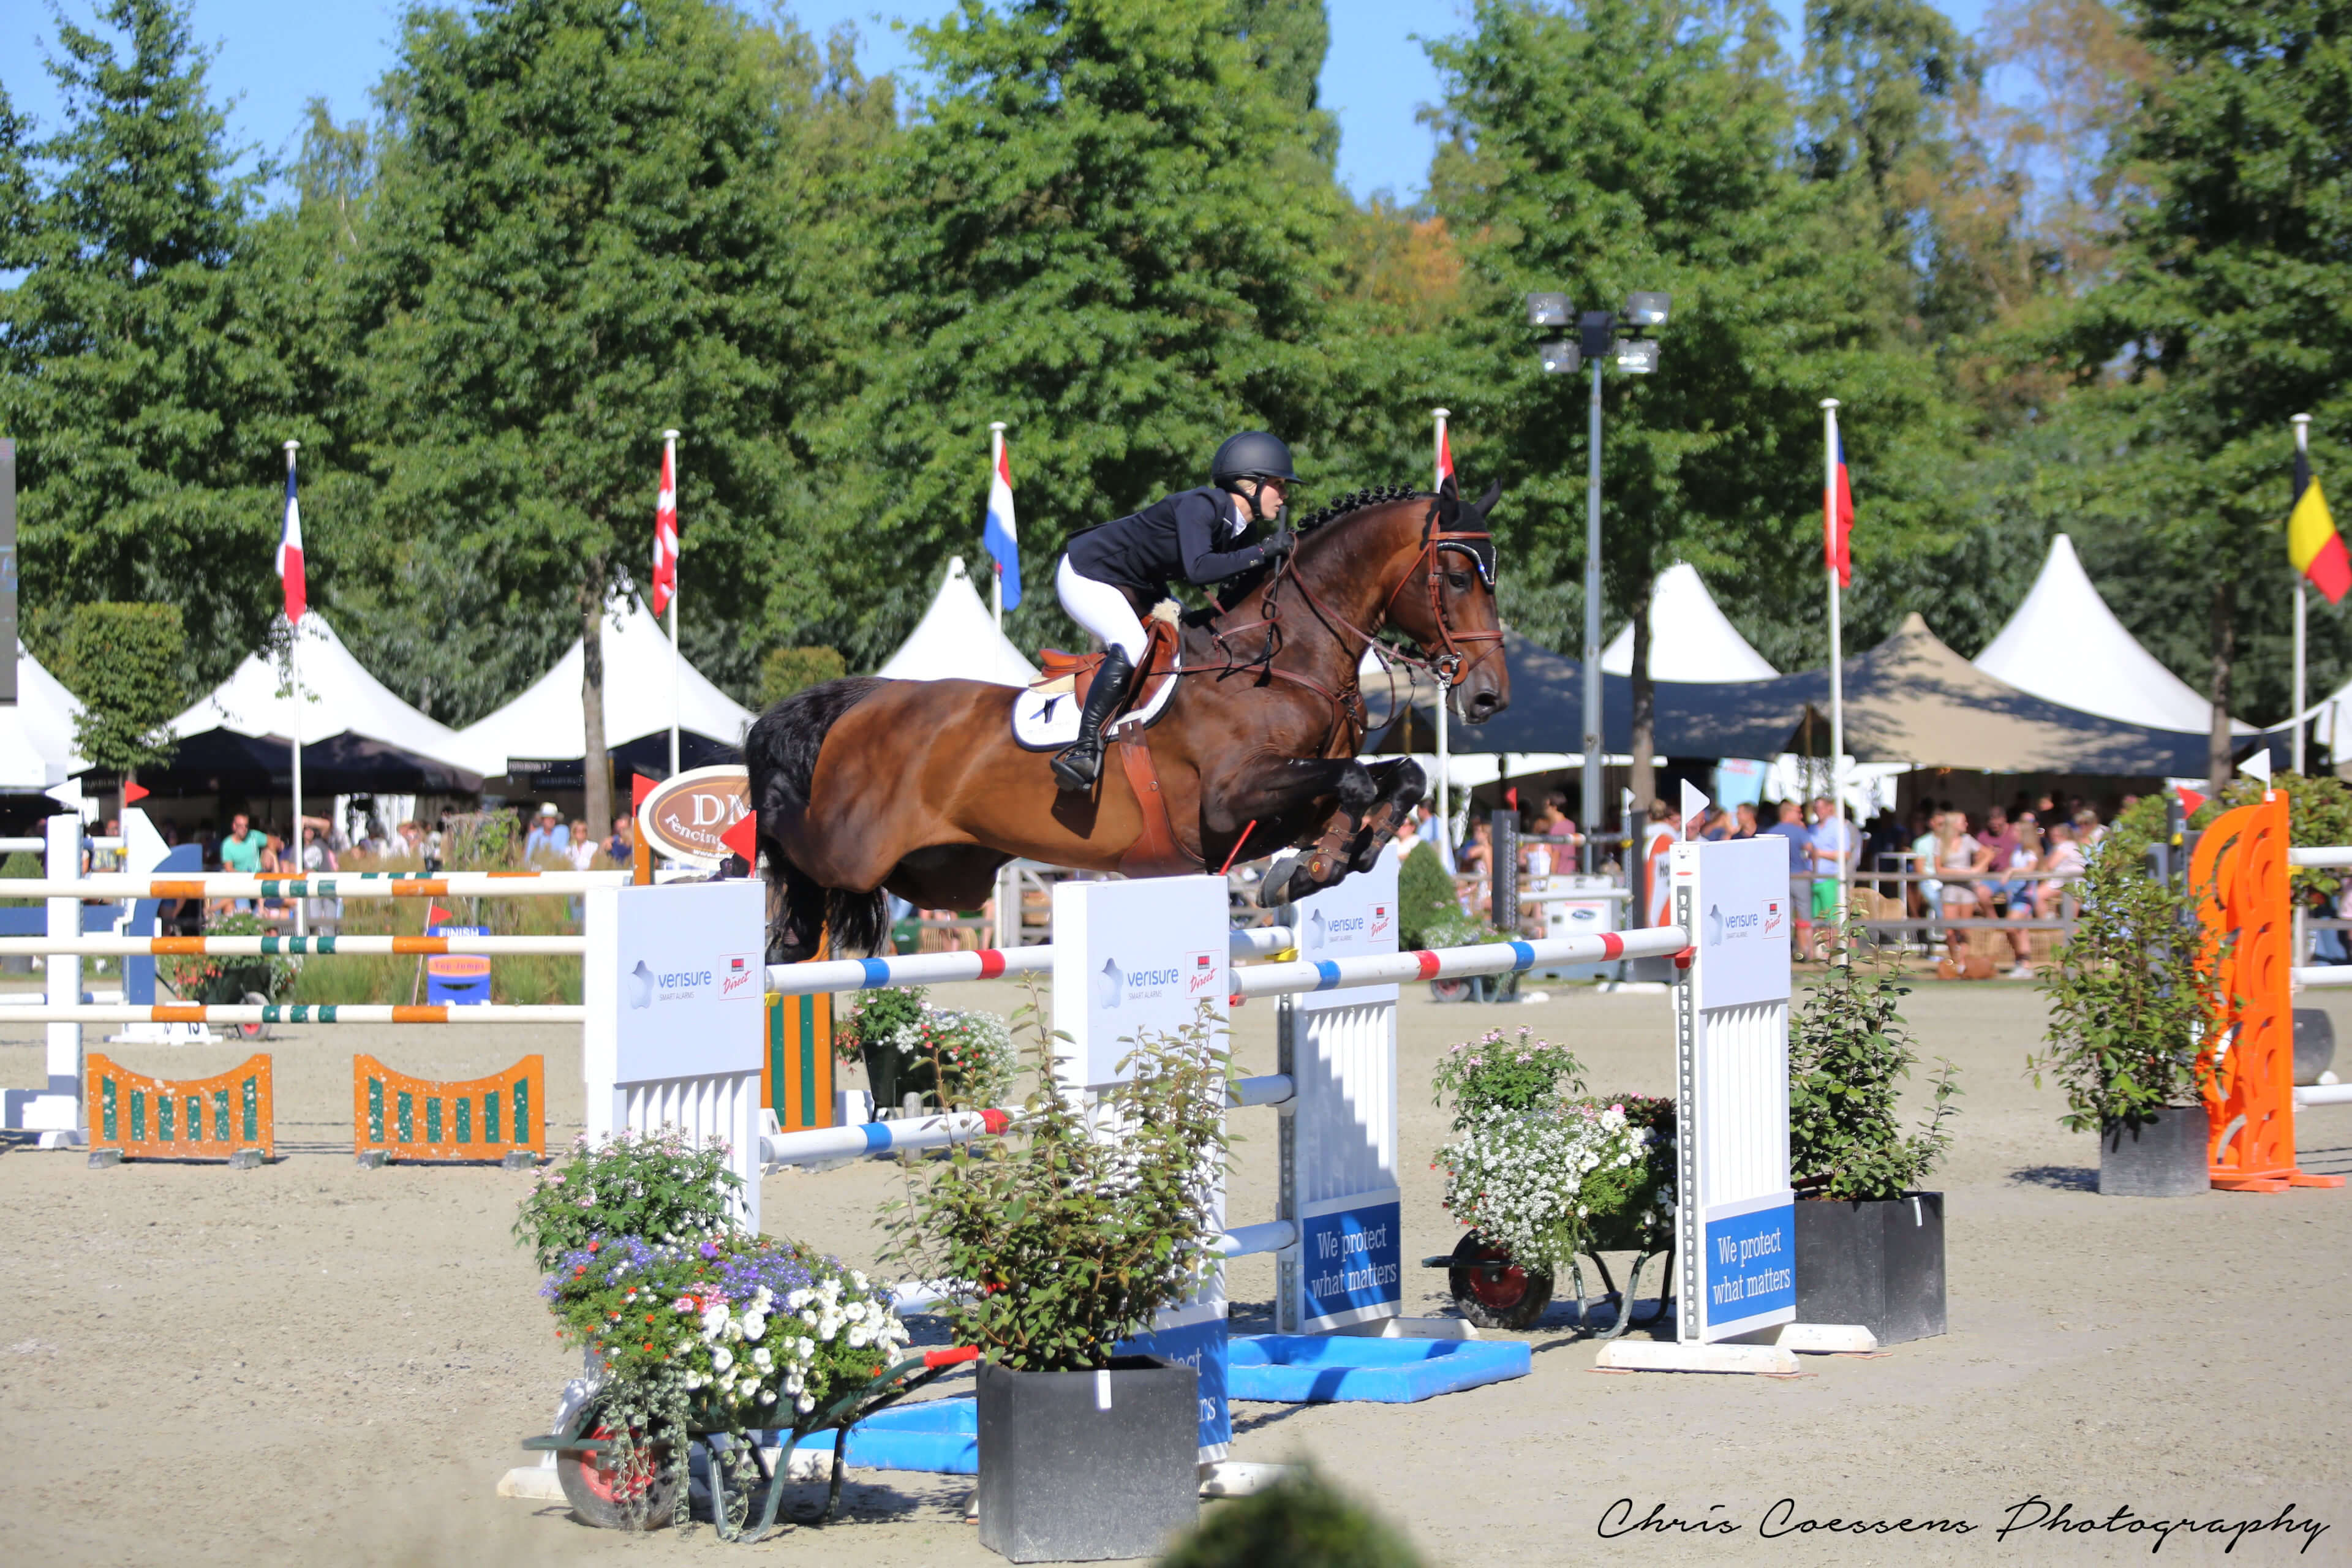 EMIR DE VY clear in 150 LR @ Zandhoven